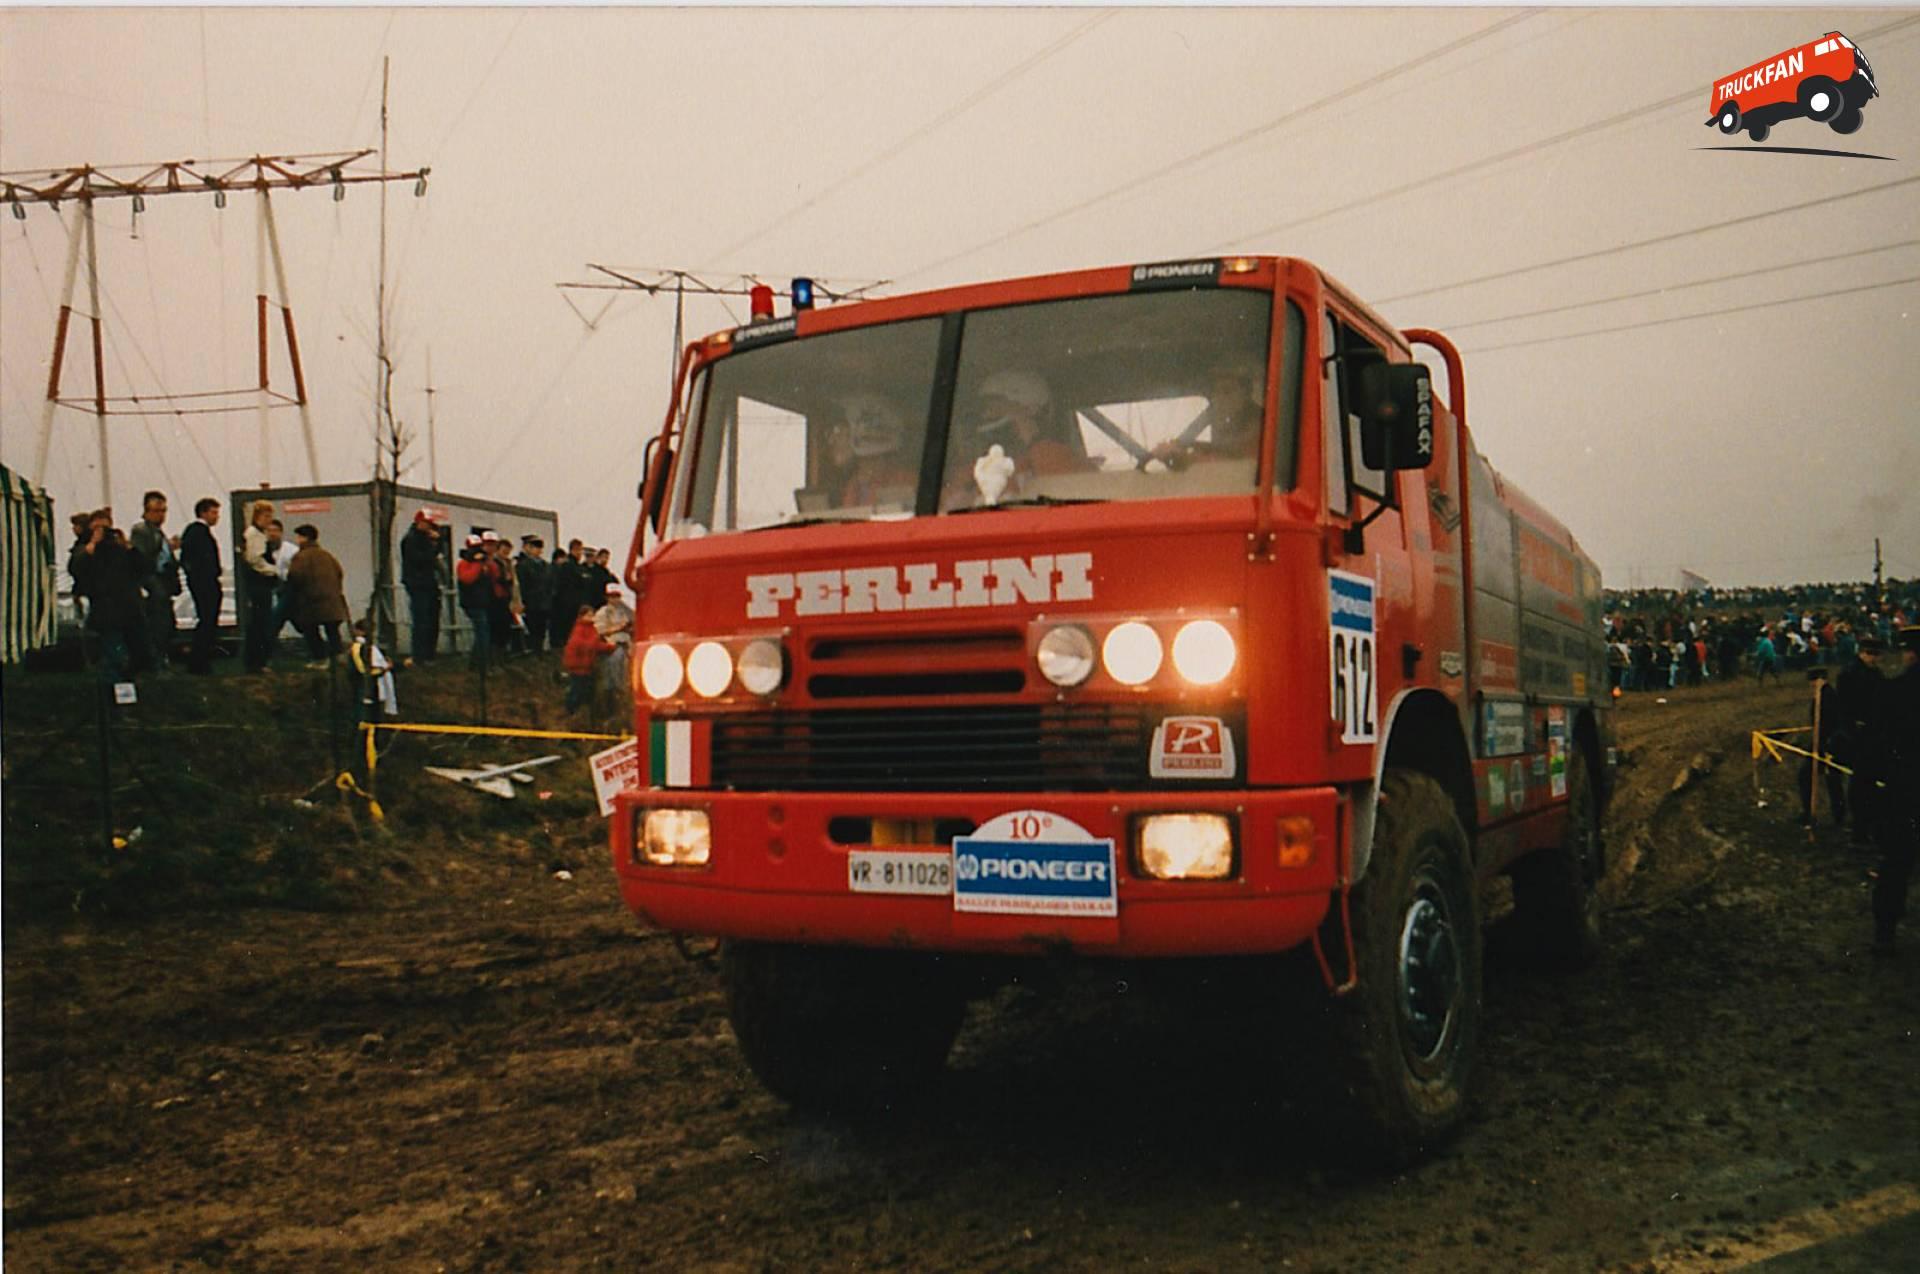 Perlini 105F Red Tiger